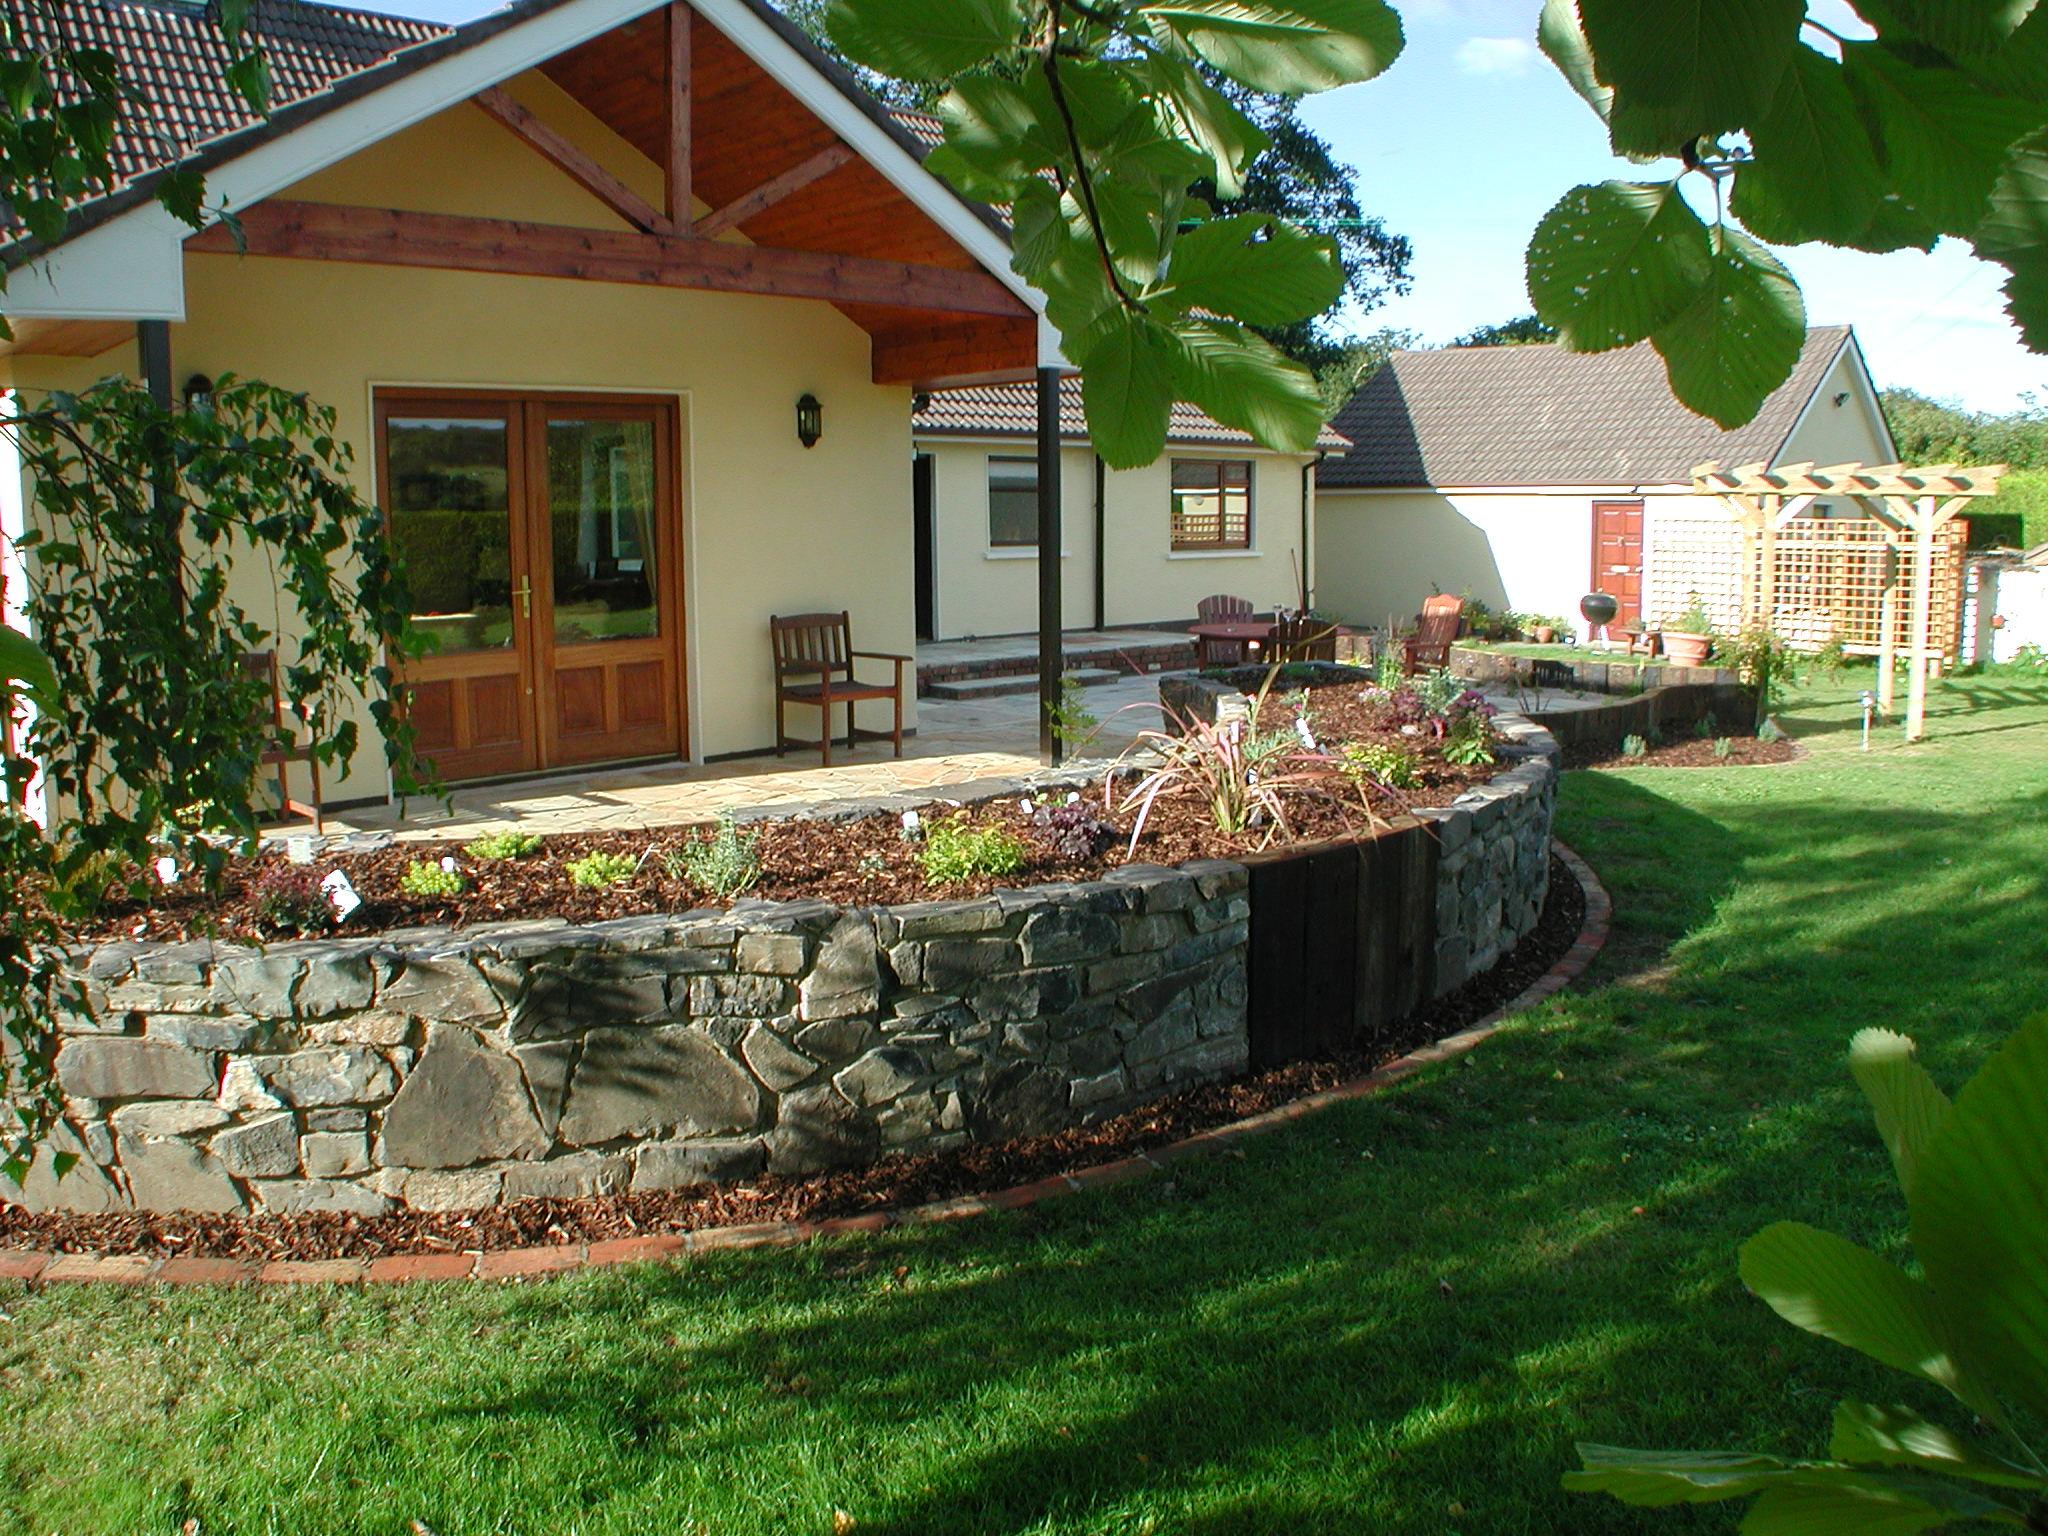 Raised beds garden design dublin for Garden design dublin